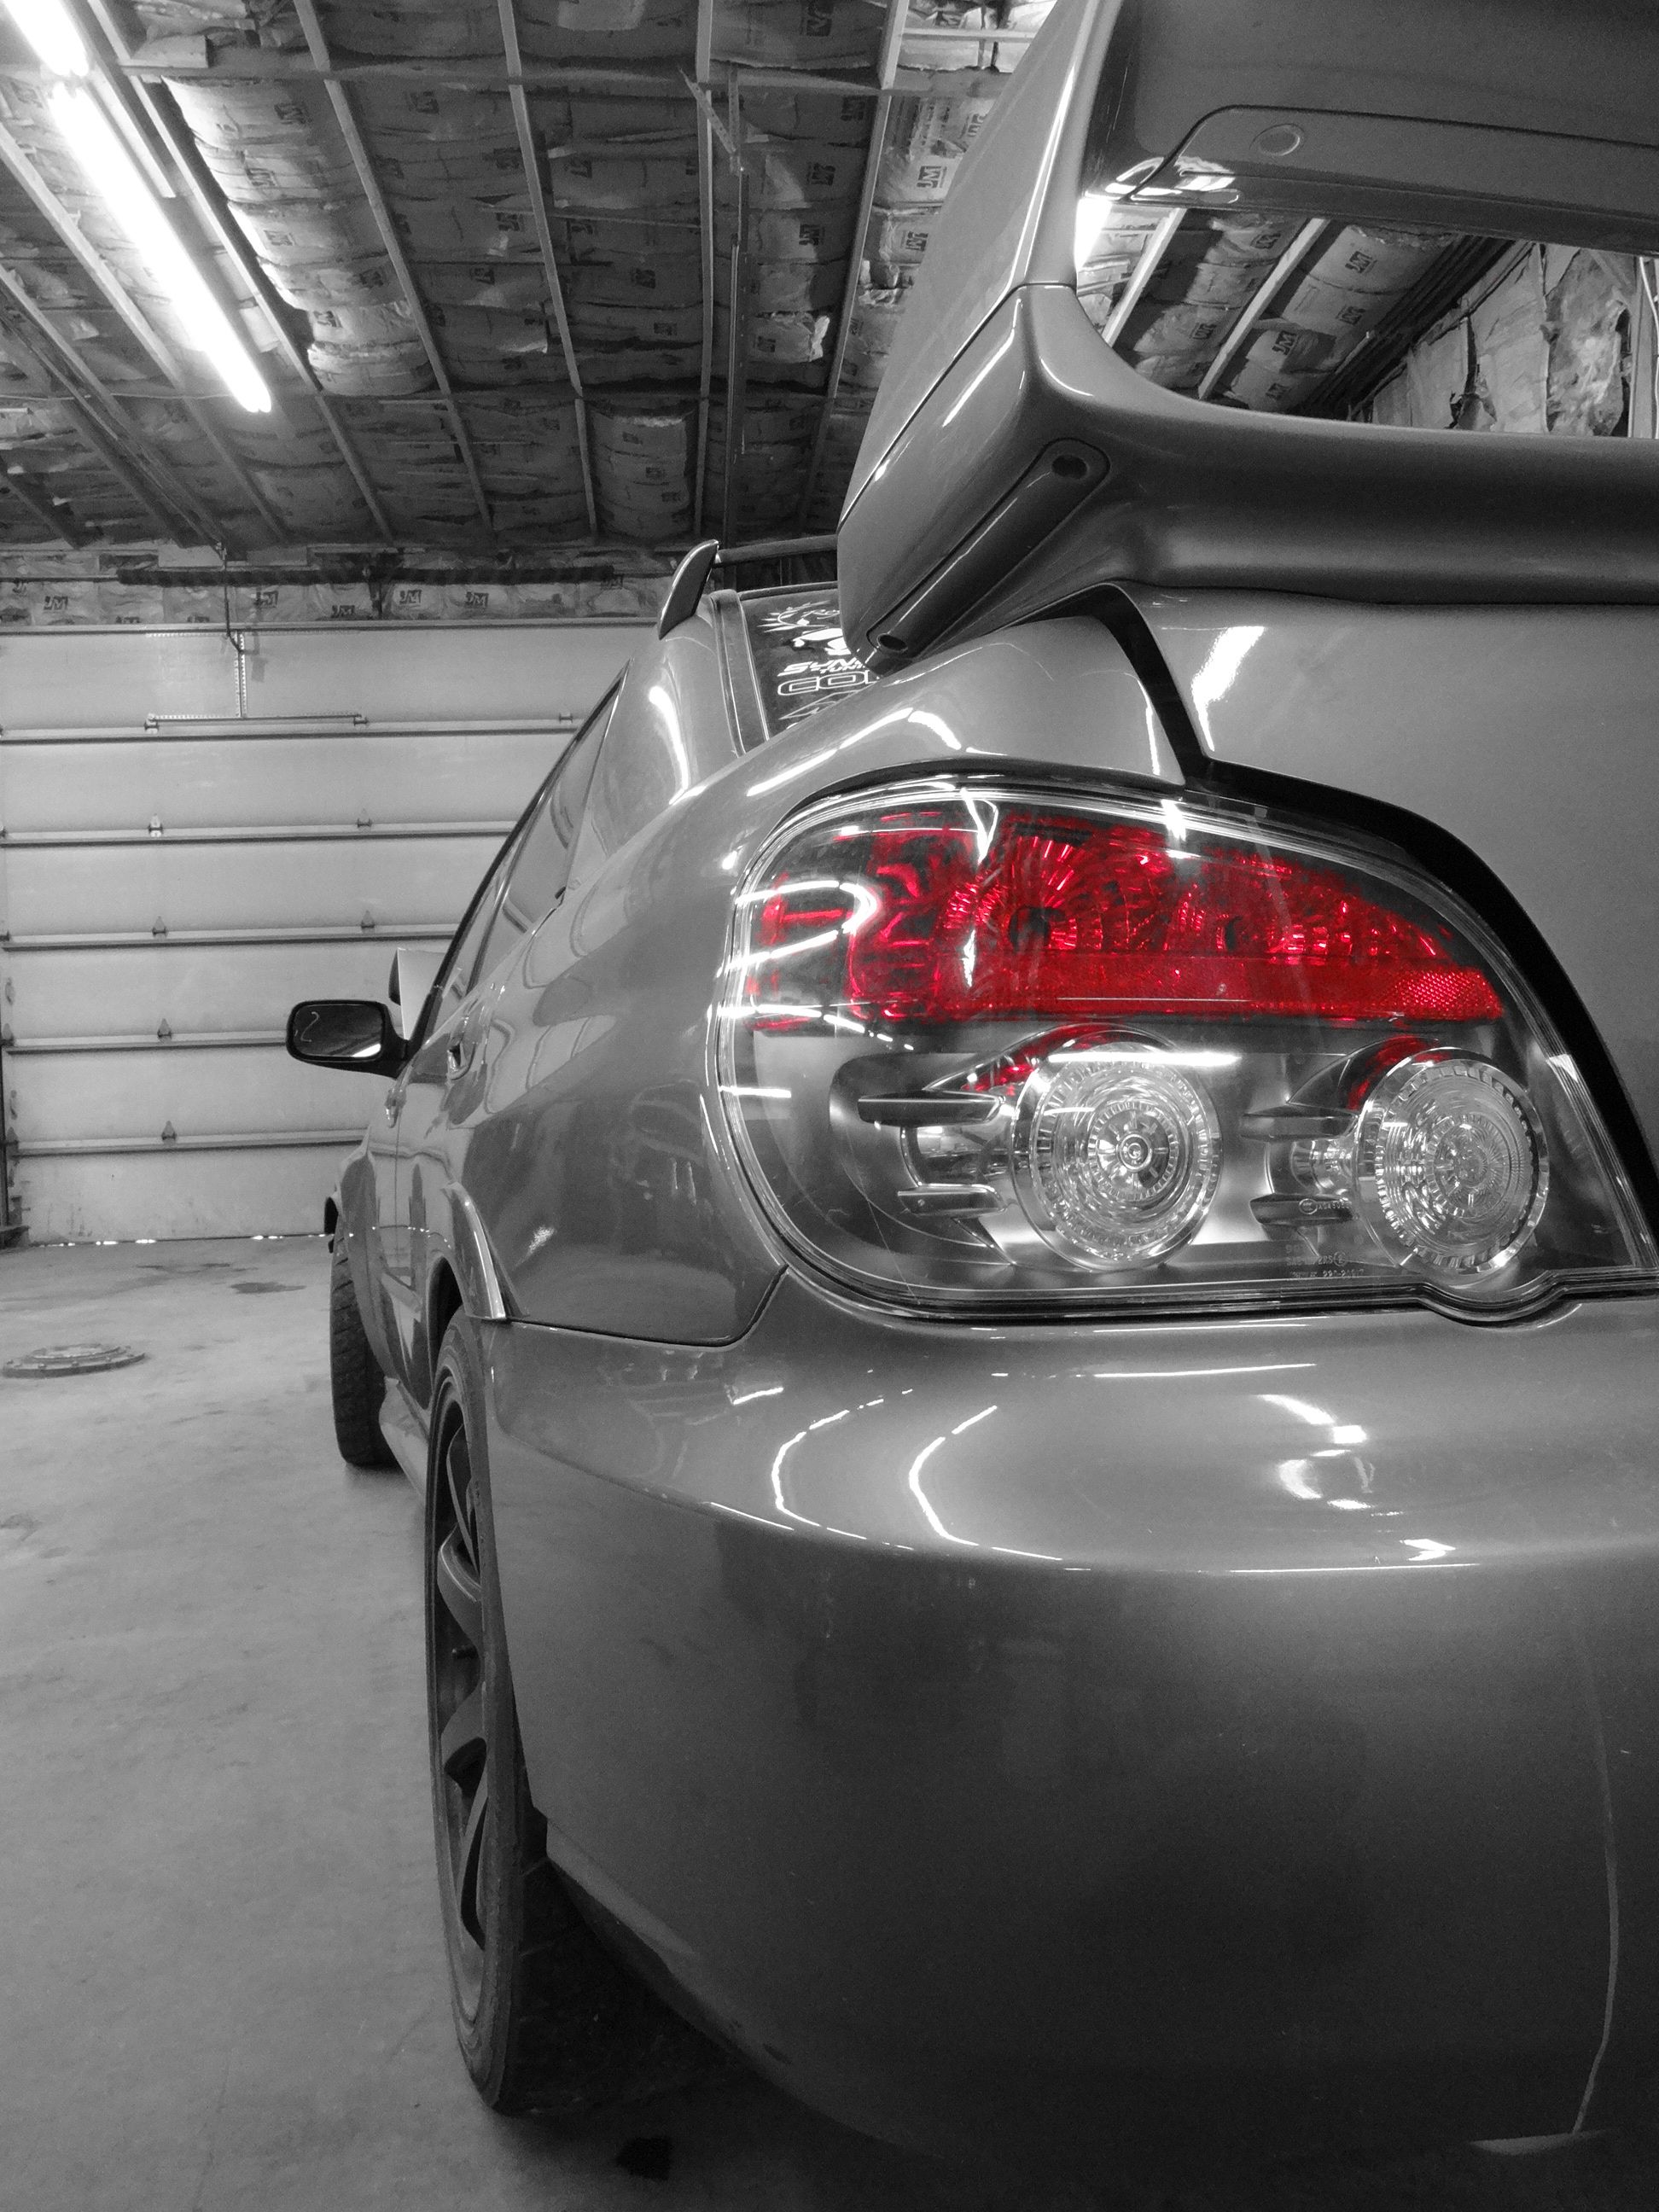 06 Synergy STI. www.facebook.com/oakleafautosalvage